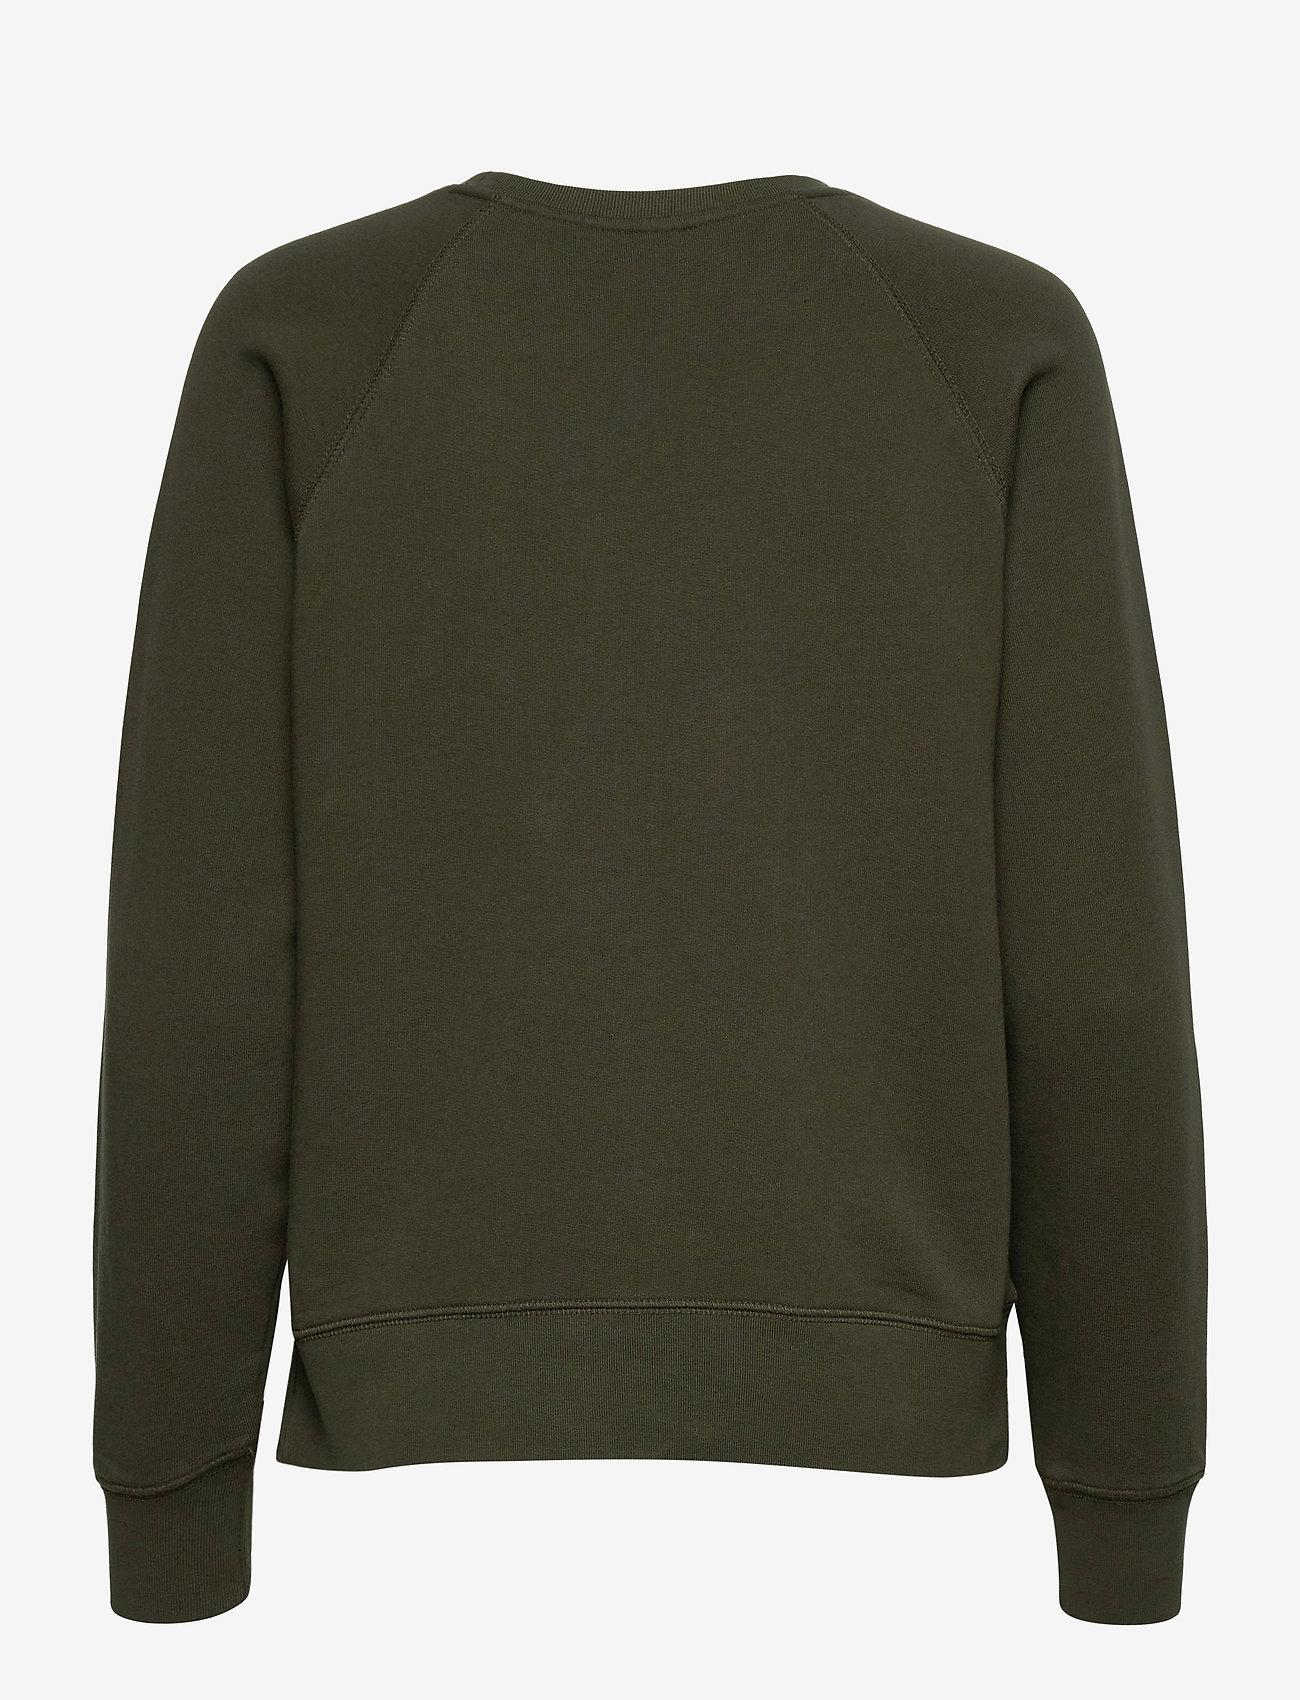 Zadig & Voltaire - UPPER BLASON BRODE TONAL EMBROIDERED COTTON SWEATS - sweatshirts & hættetrøjer - khaki - 2